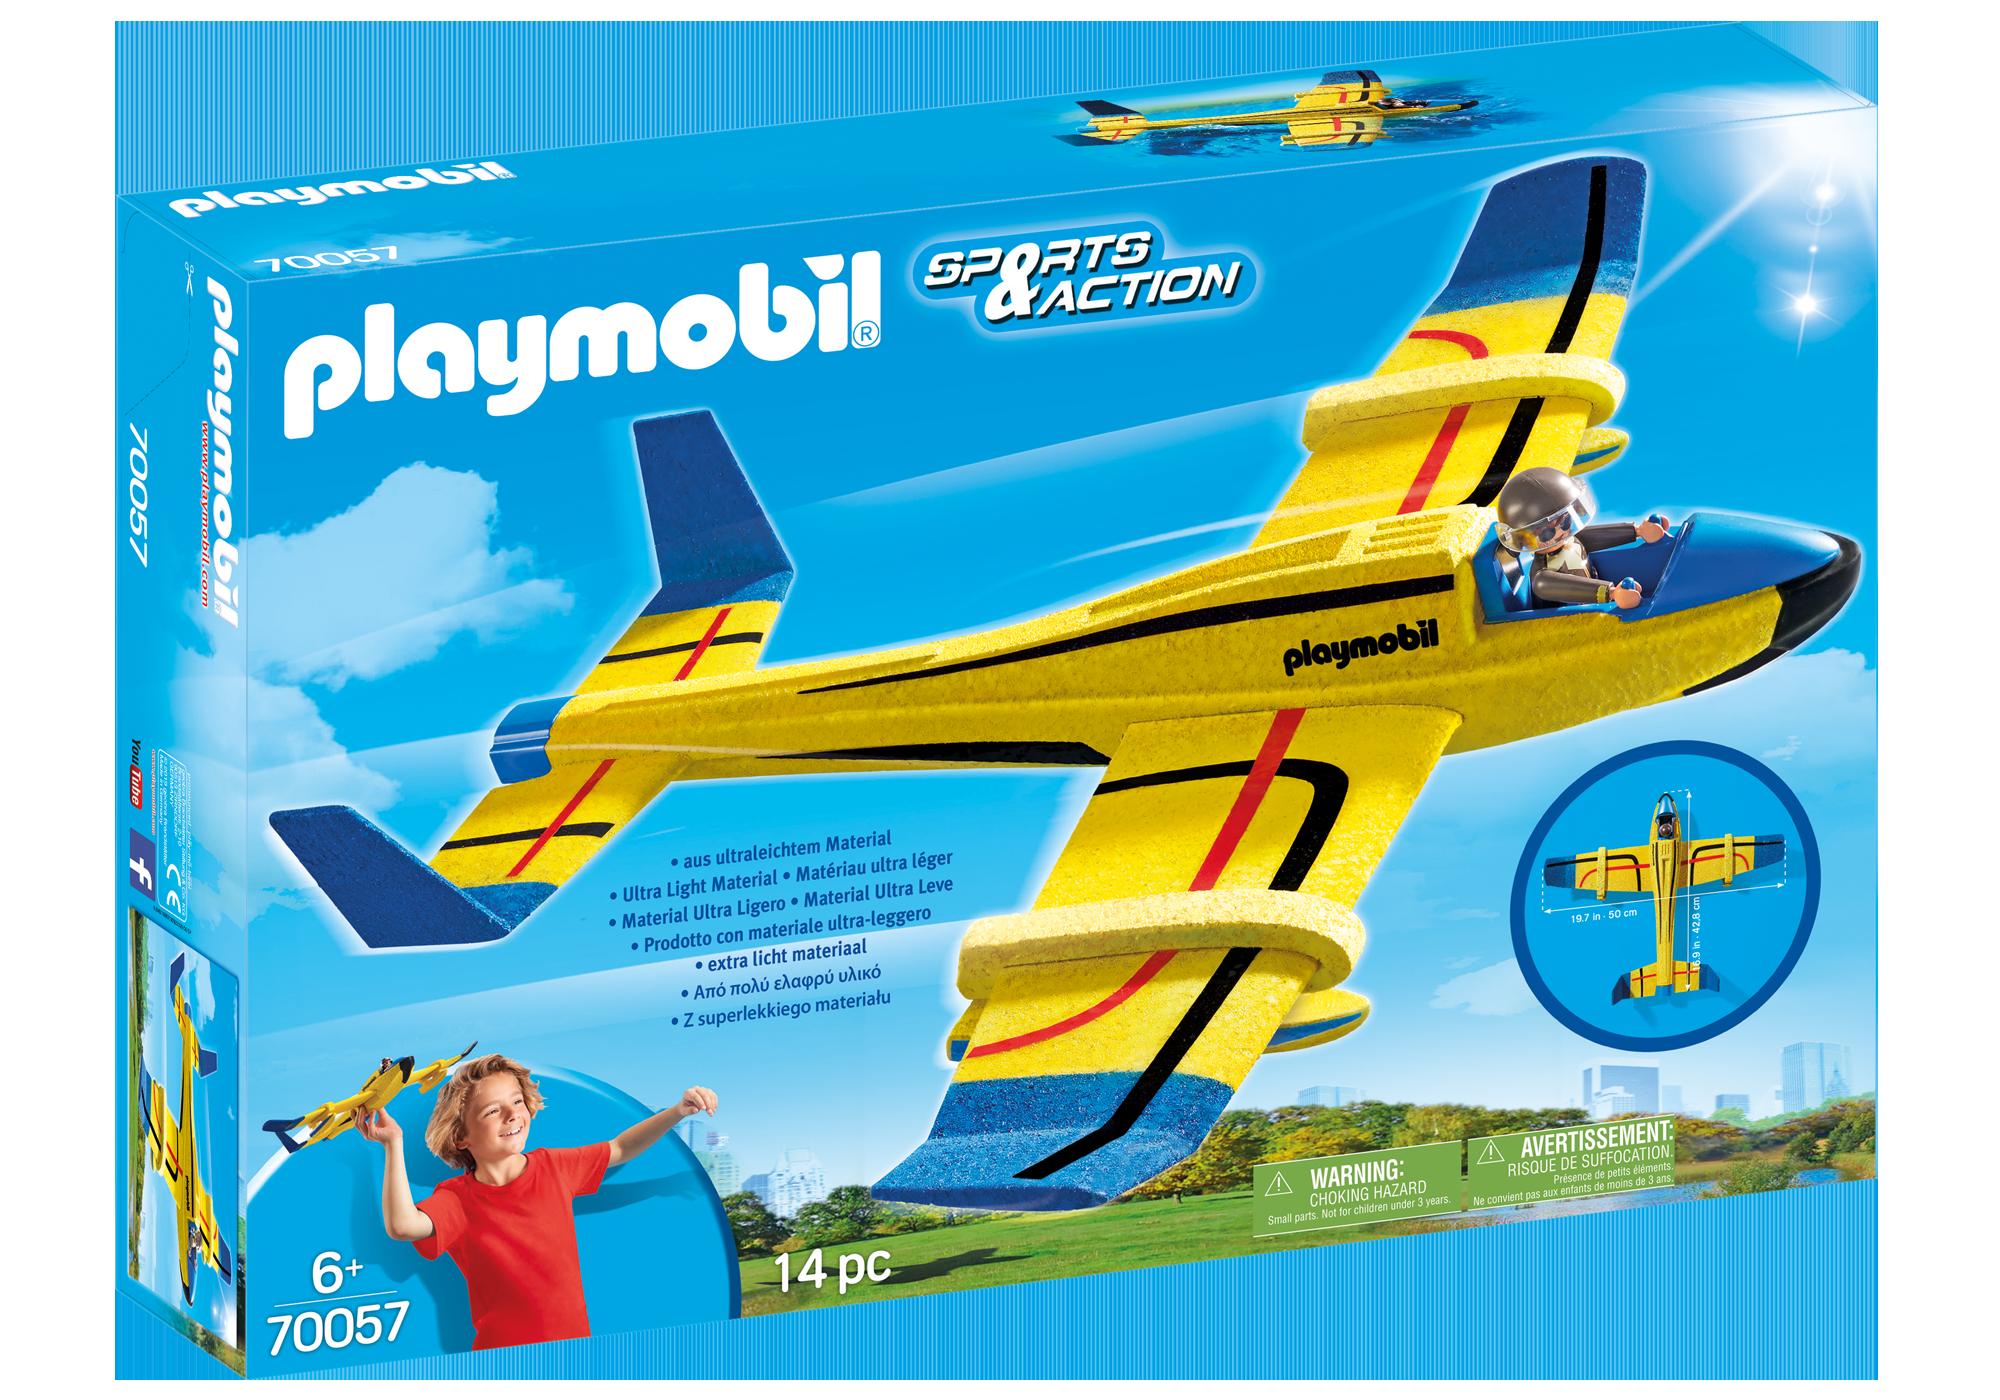 http://media.playmobil.com/i/playmobil/70057_product_box_front/Kast-og-glid vandfly